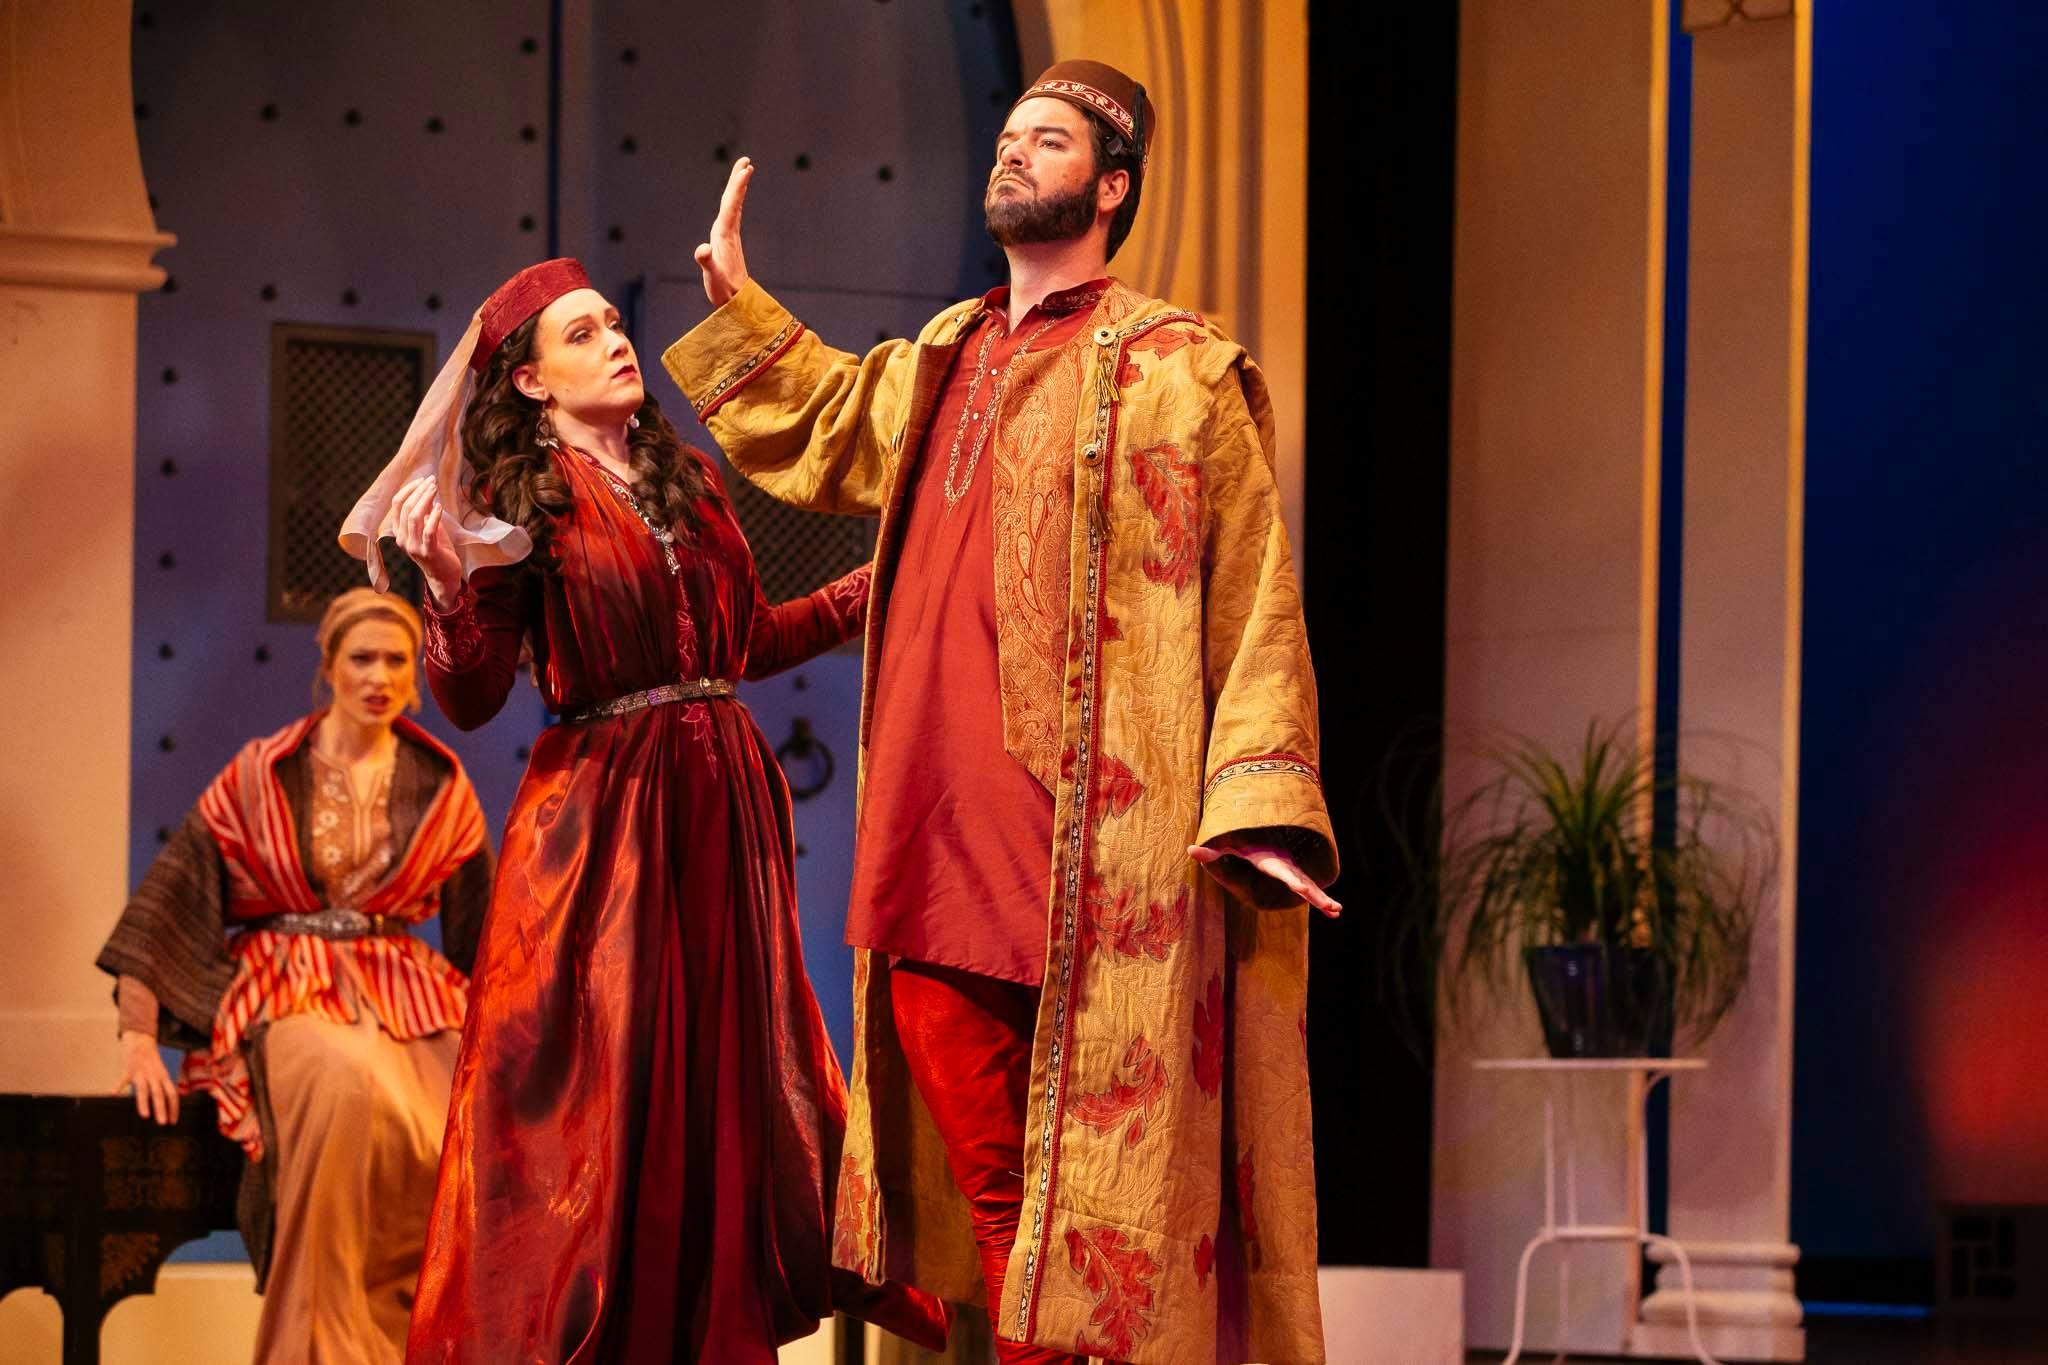 L'italiana in Algeri - Opera Memphis 2018 (Assistant Director) Photo Credit: Ziggy Mack